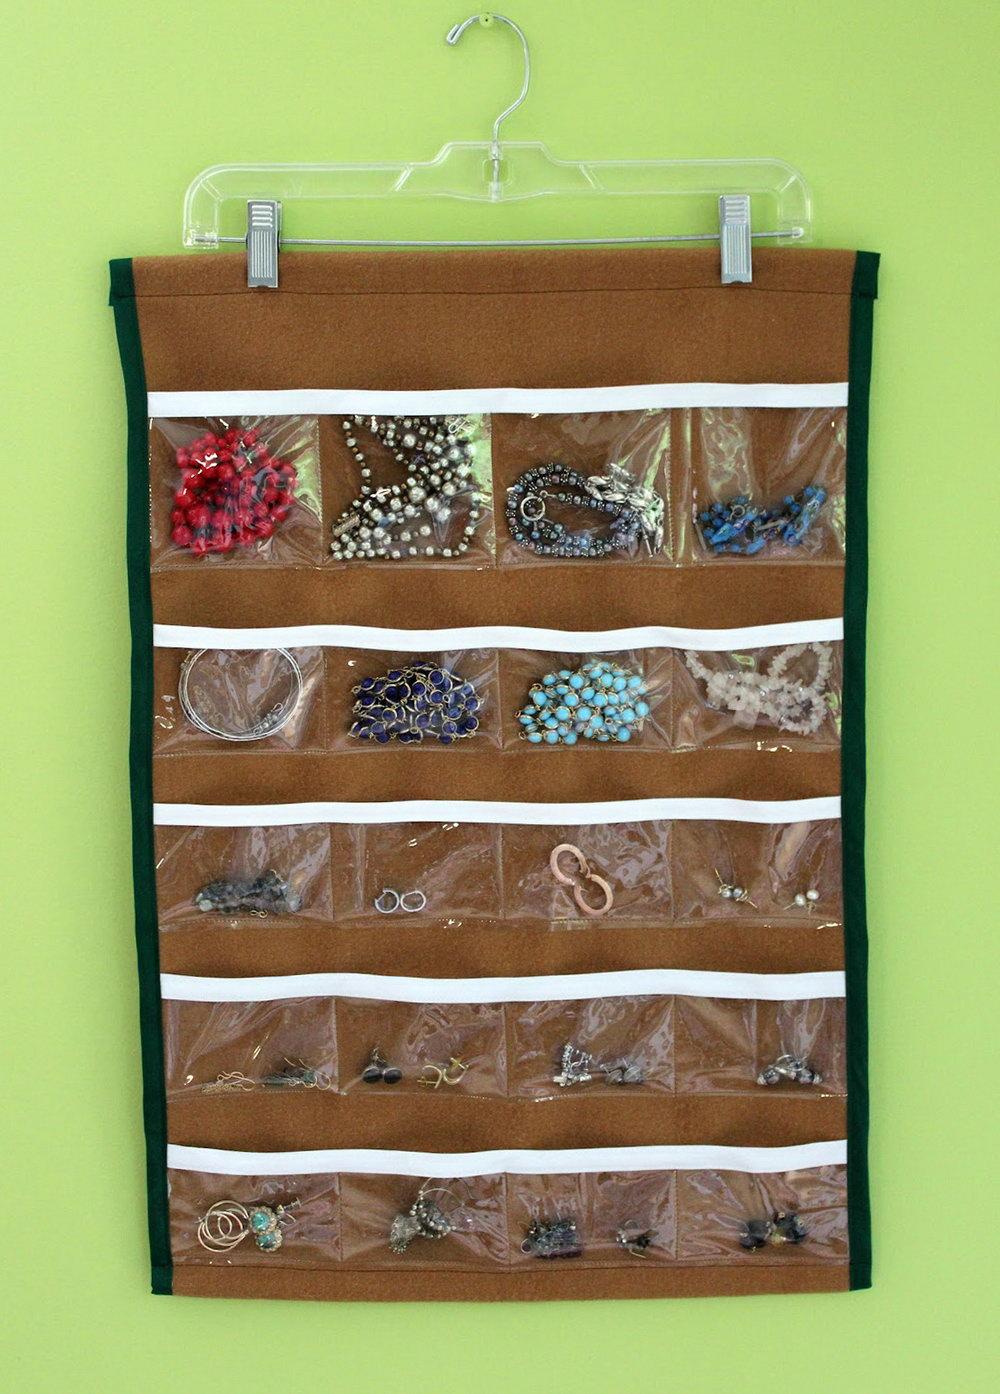 Hanging Jewelry Organizer With Pockets